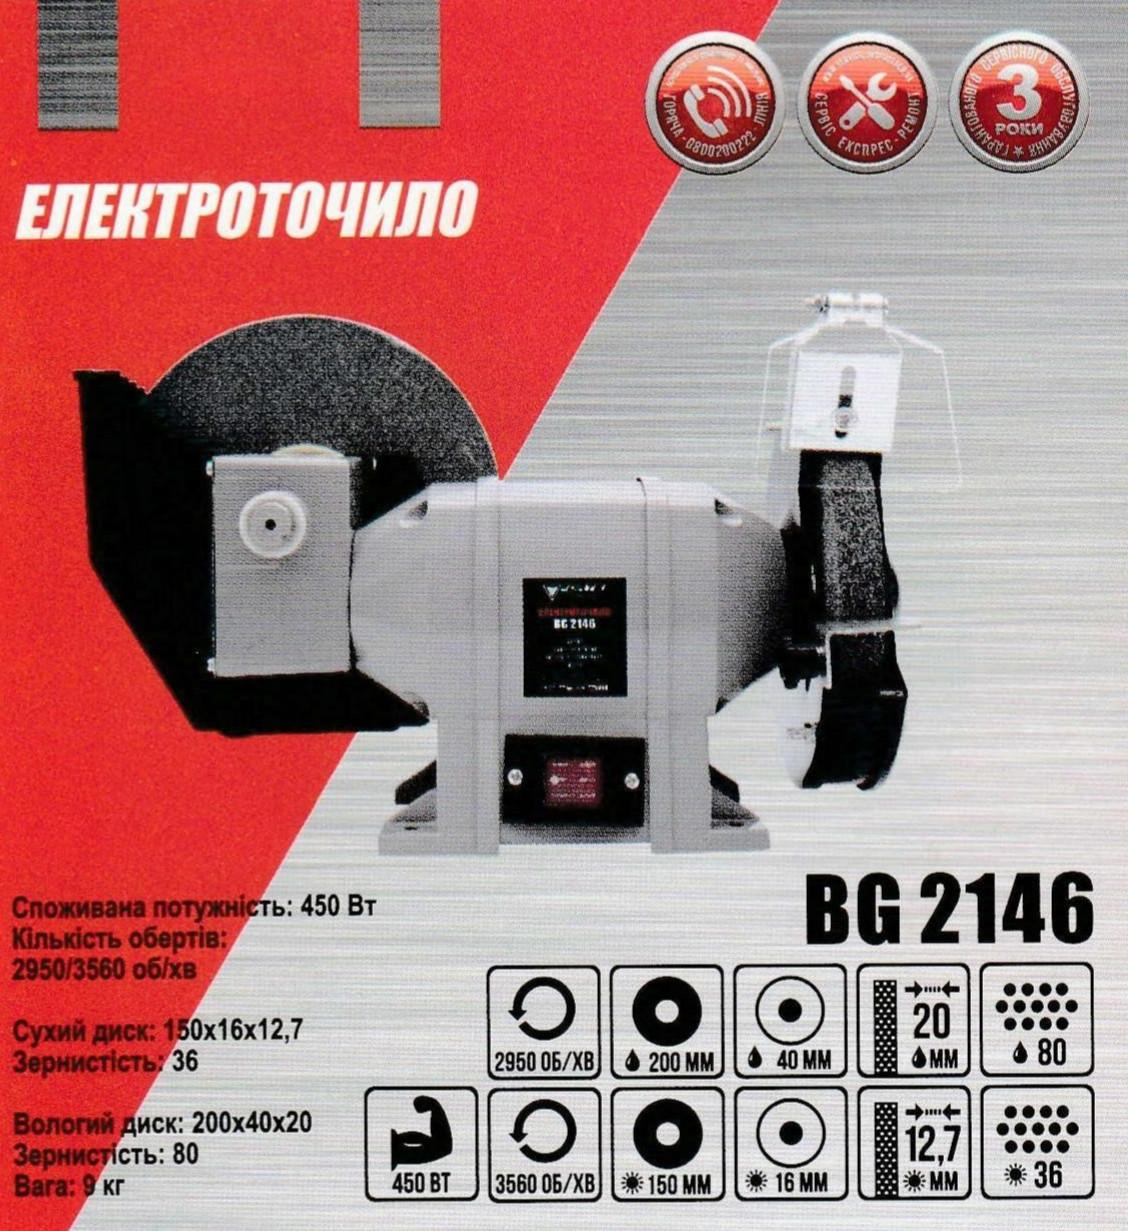 Электроточило Forte BG 2146